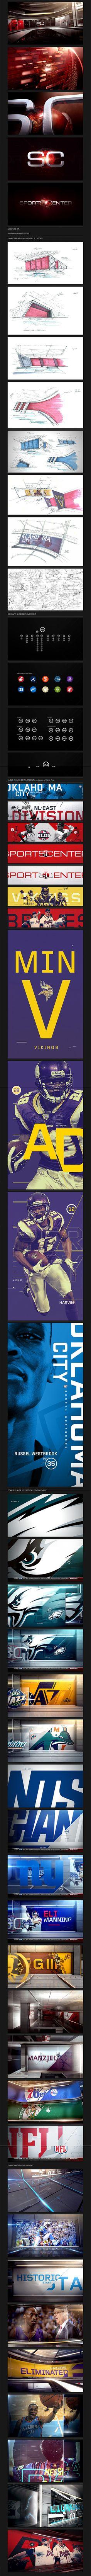 sport central.  Sports graphics. Motion design